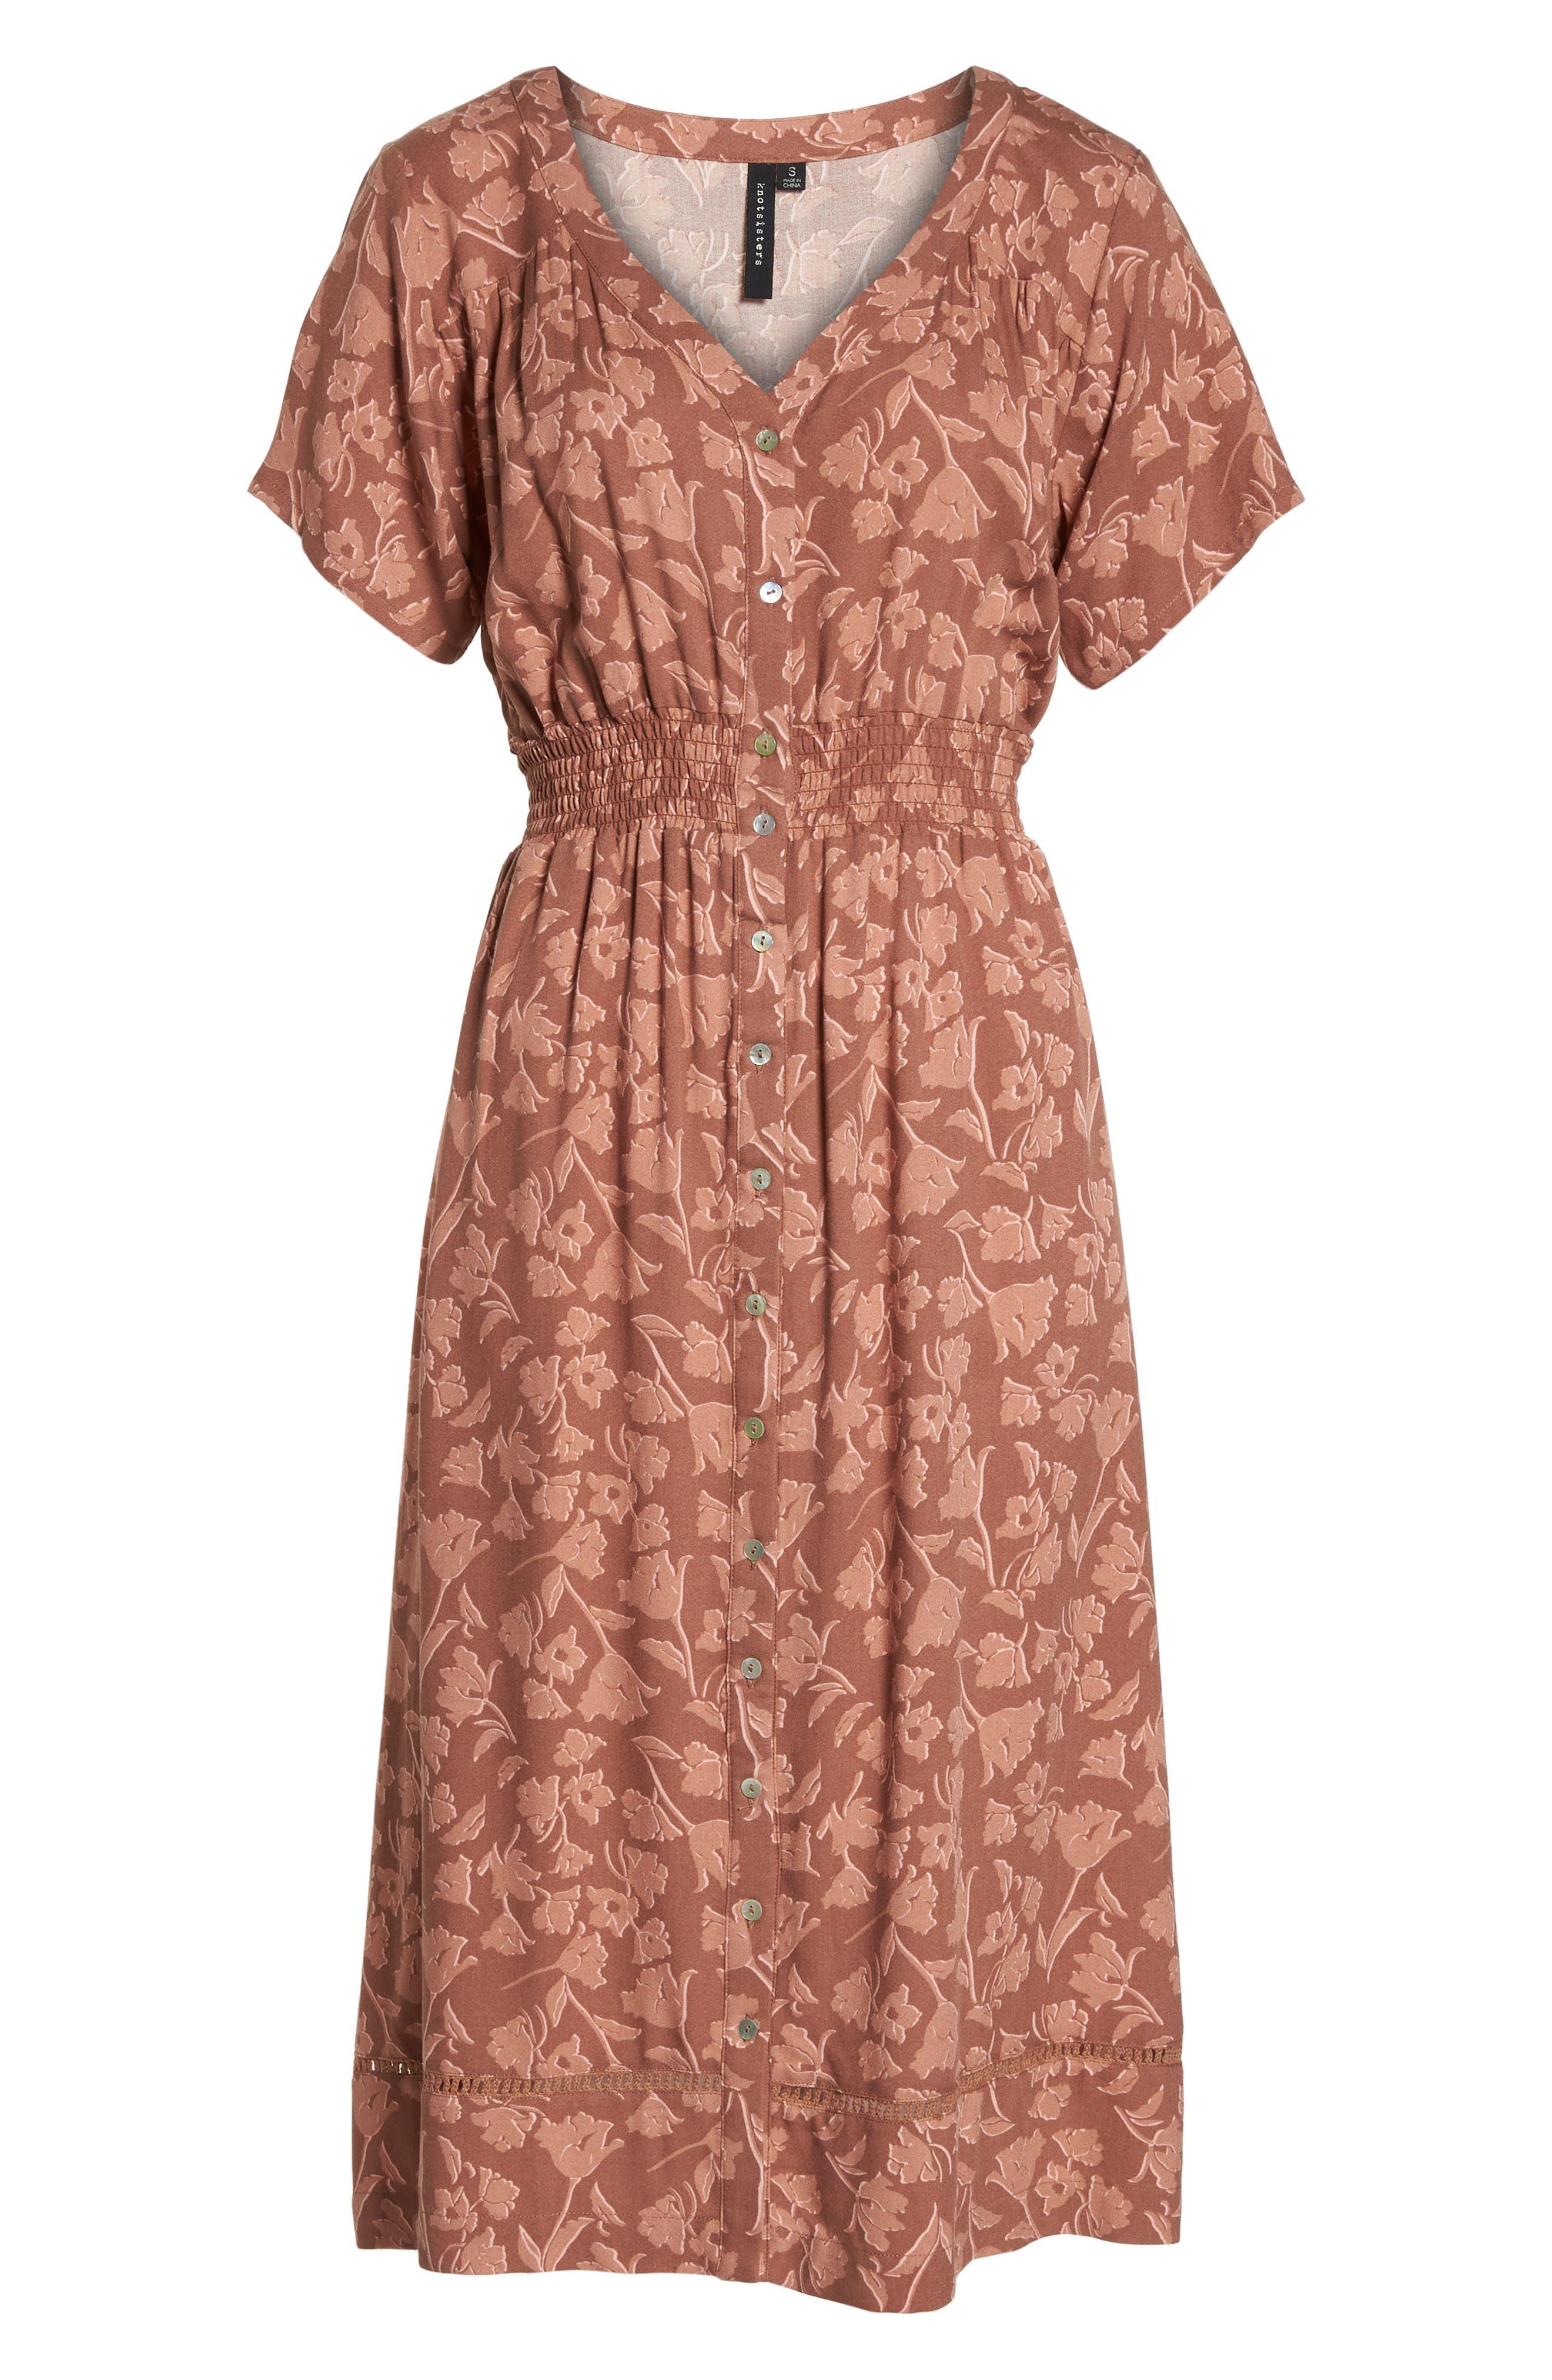 Farrell Floral Smock Waist Dress,                             Alternate thumbnail 7, color,                             Sienna Tulips Print